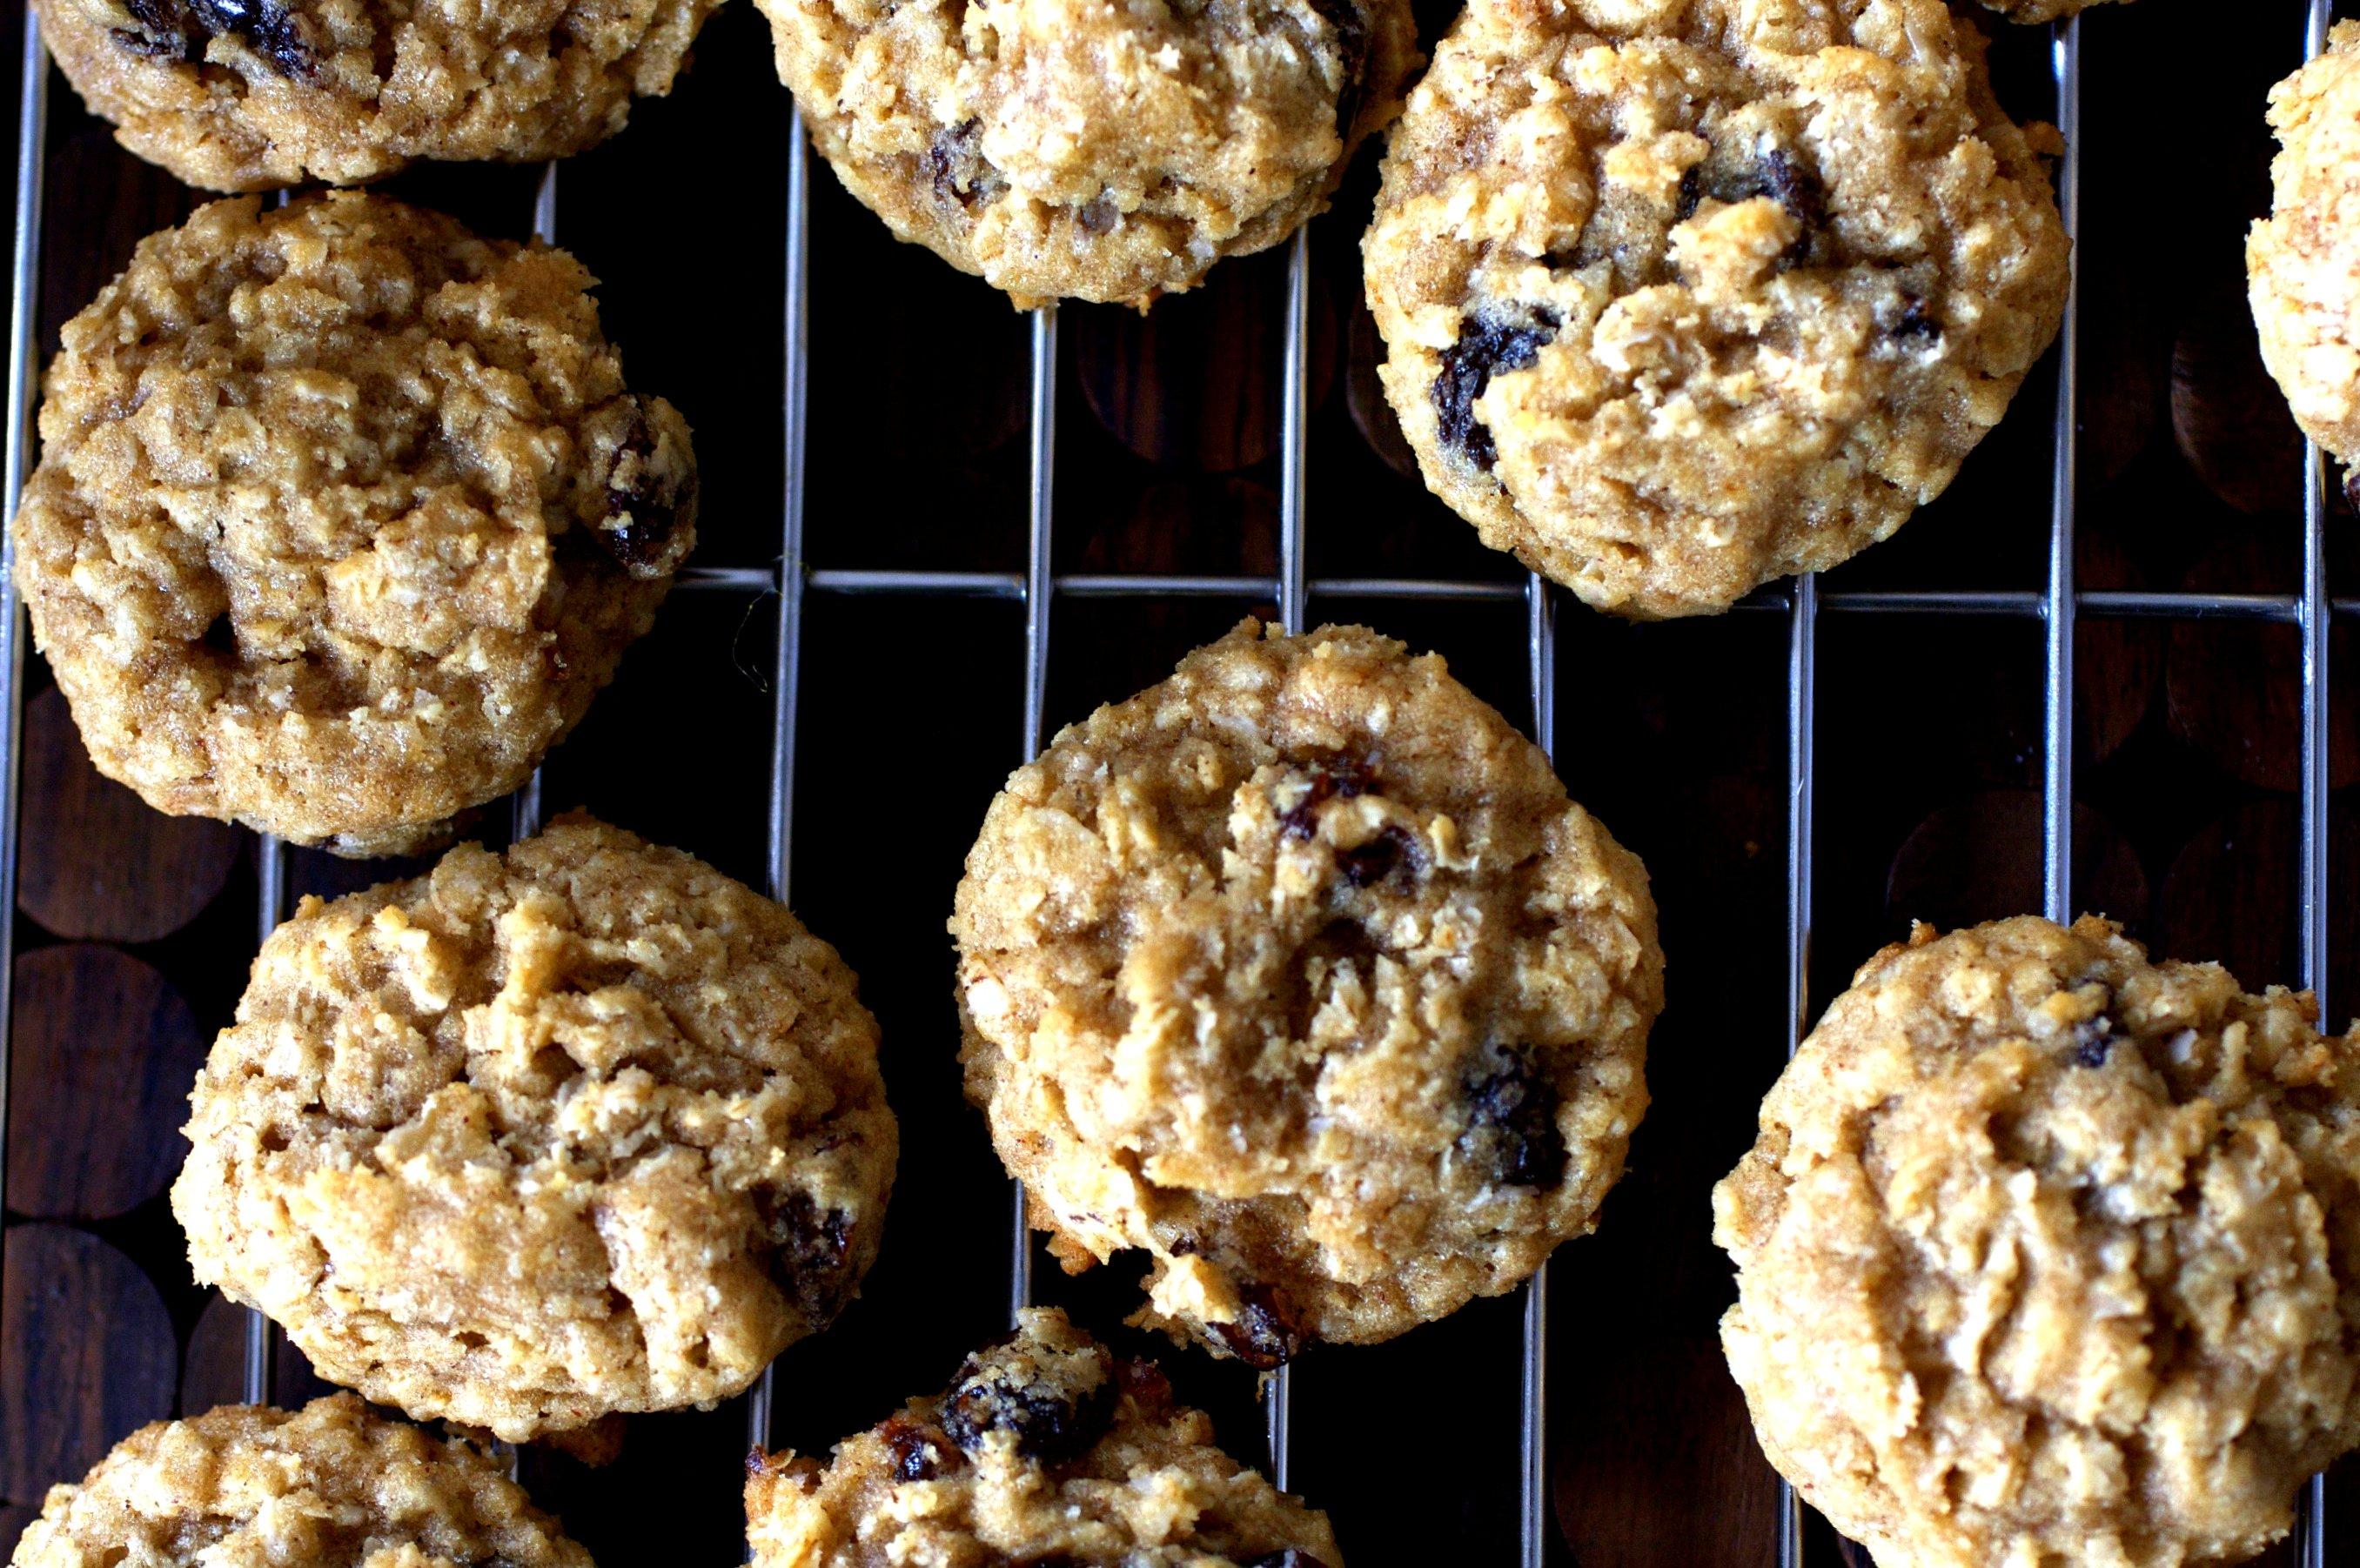 Nancy Bea Porno thick, chewy oatmeal raisin cookies – smitten kitchen